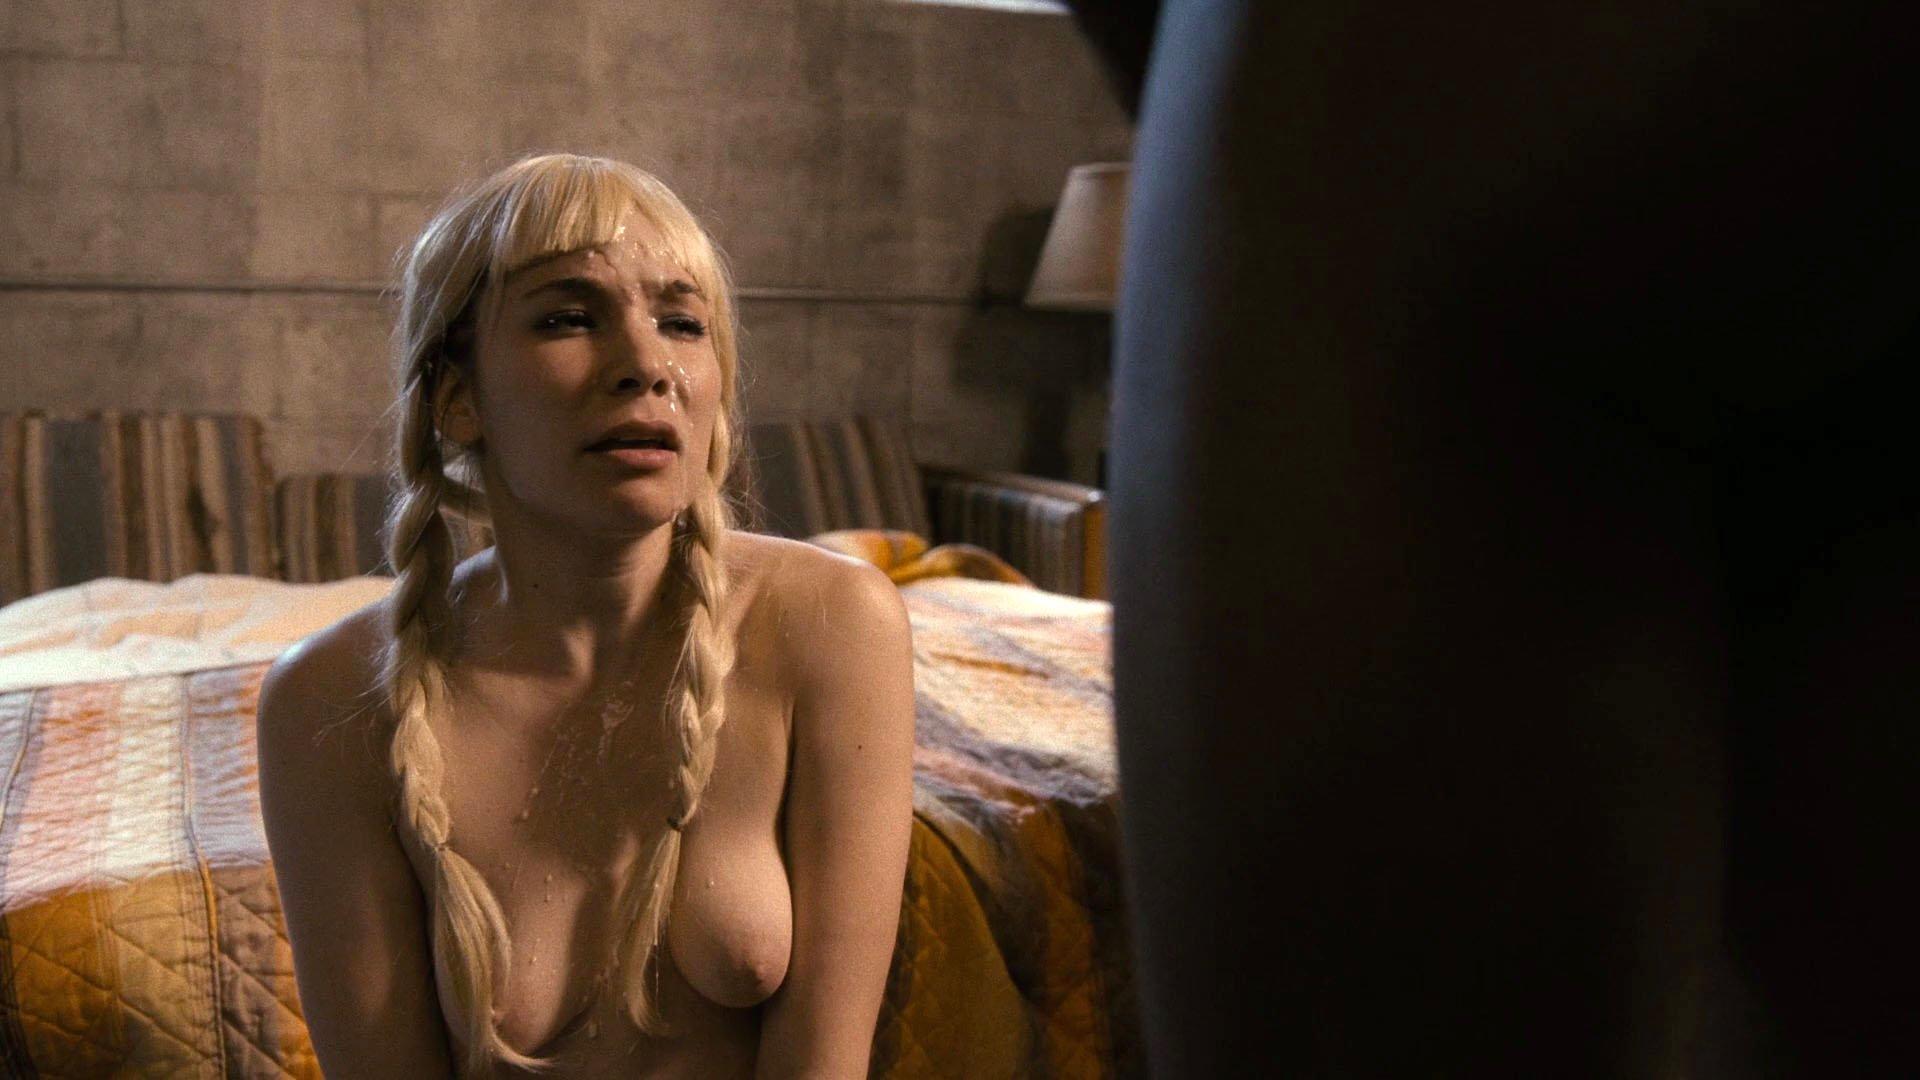 Maggie Gyllenhaal nude, Alyssa Kempinski nude - The Deuce s01e02 (2017)